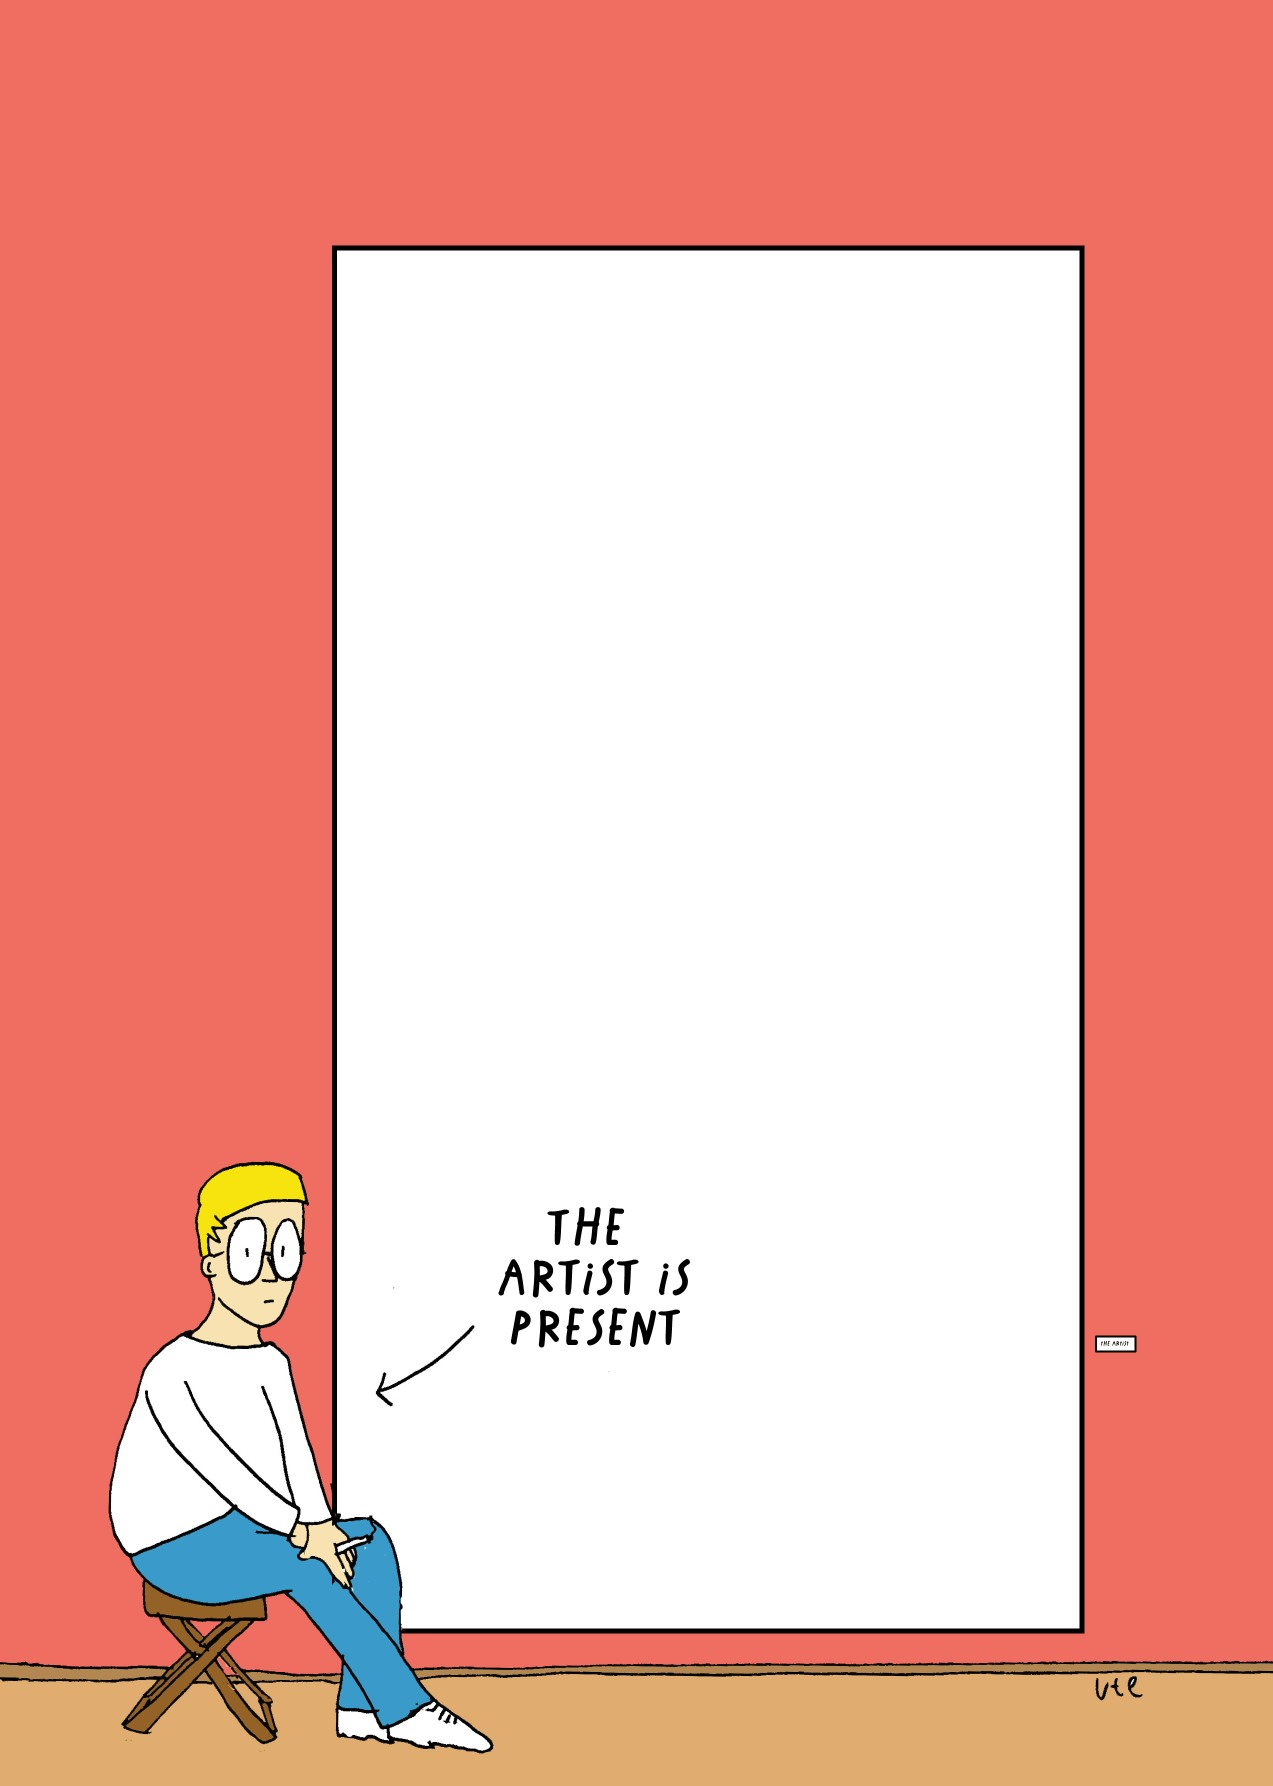 Cartoon Illustration: The Artist is present by Ute Hamelmann